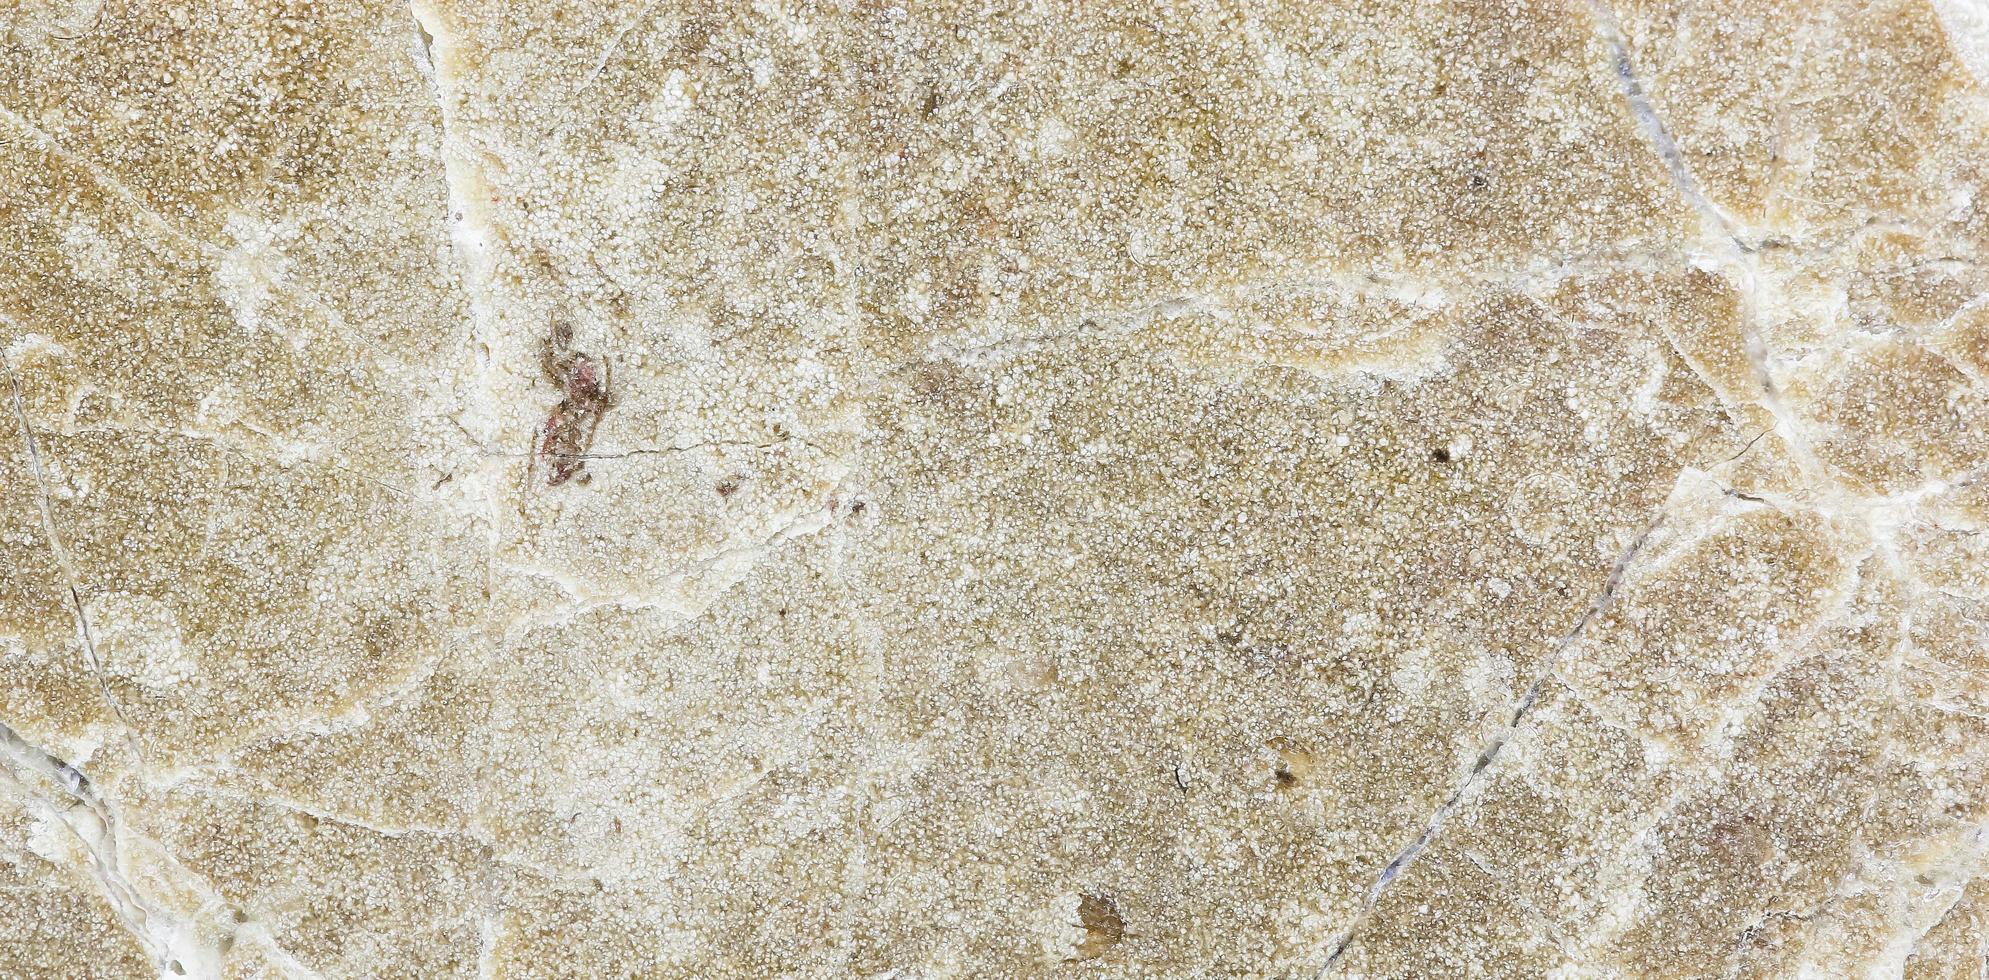 fond de pierre de marbre photo